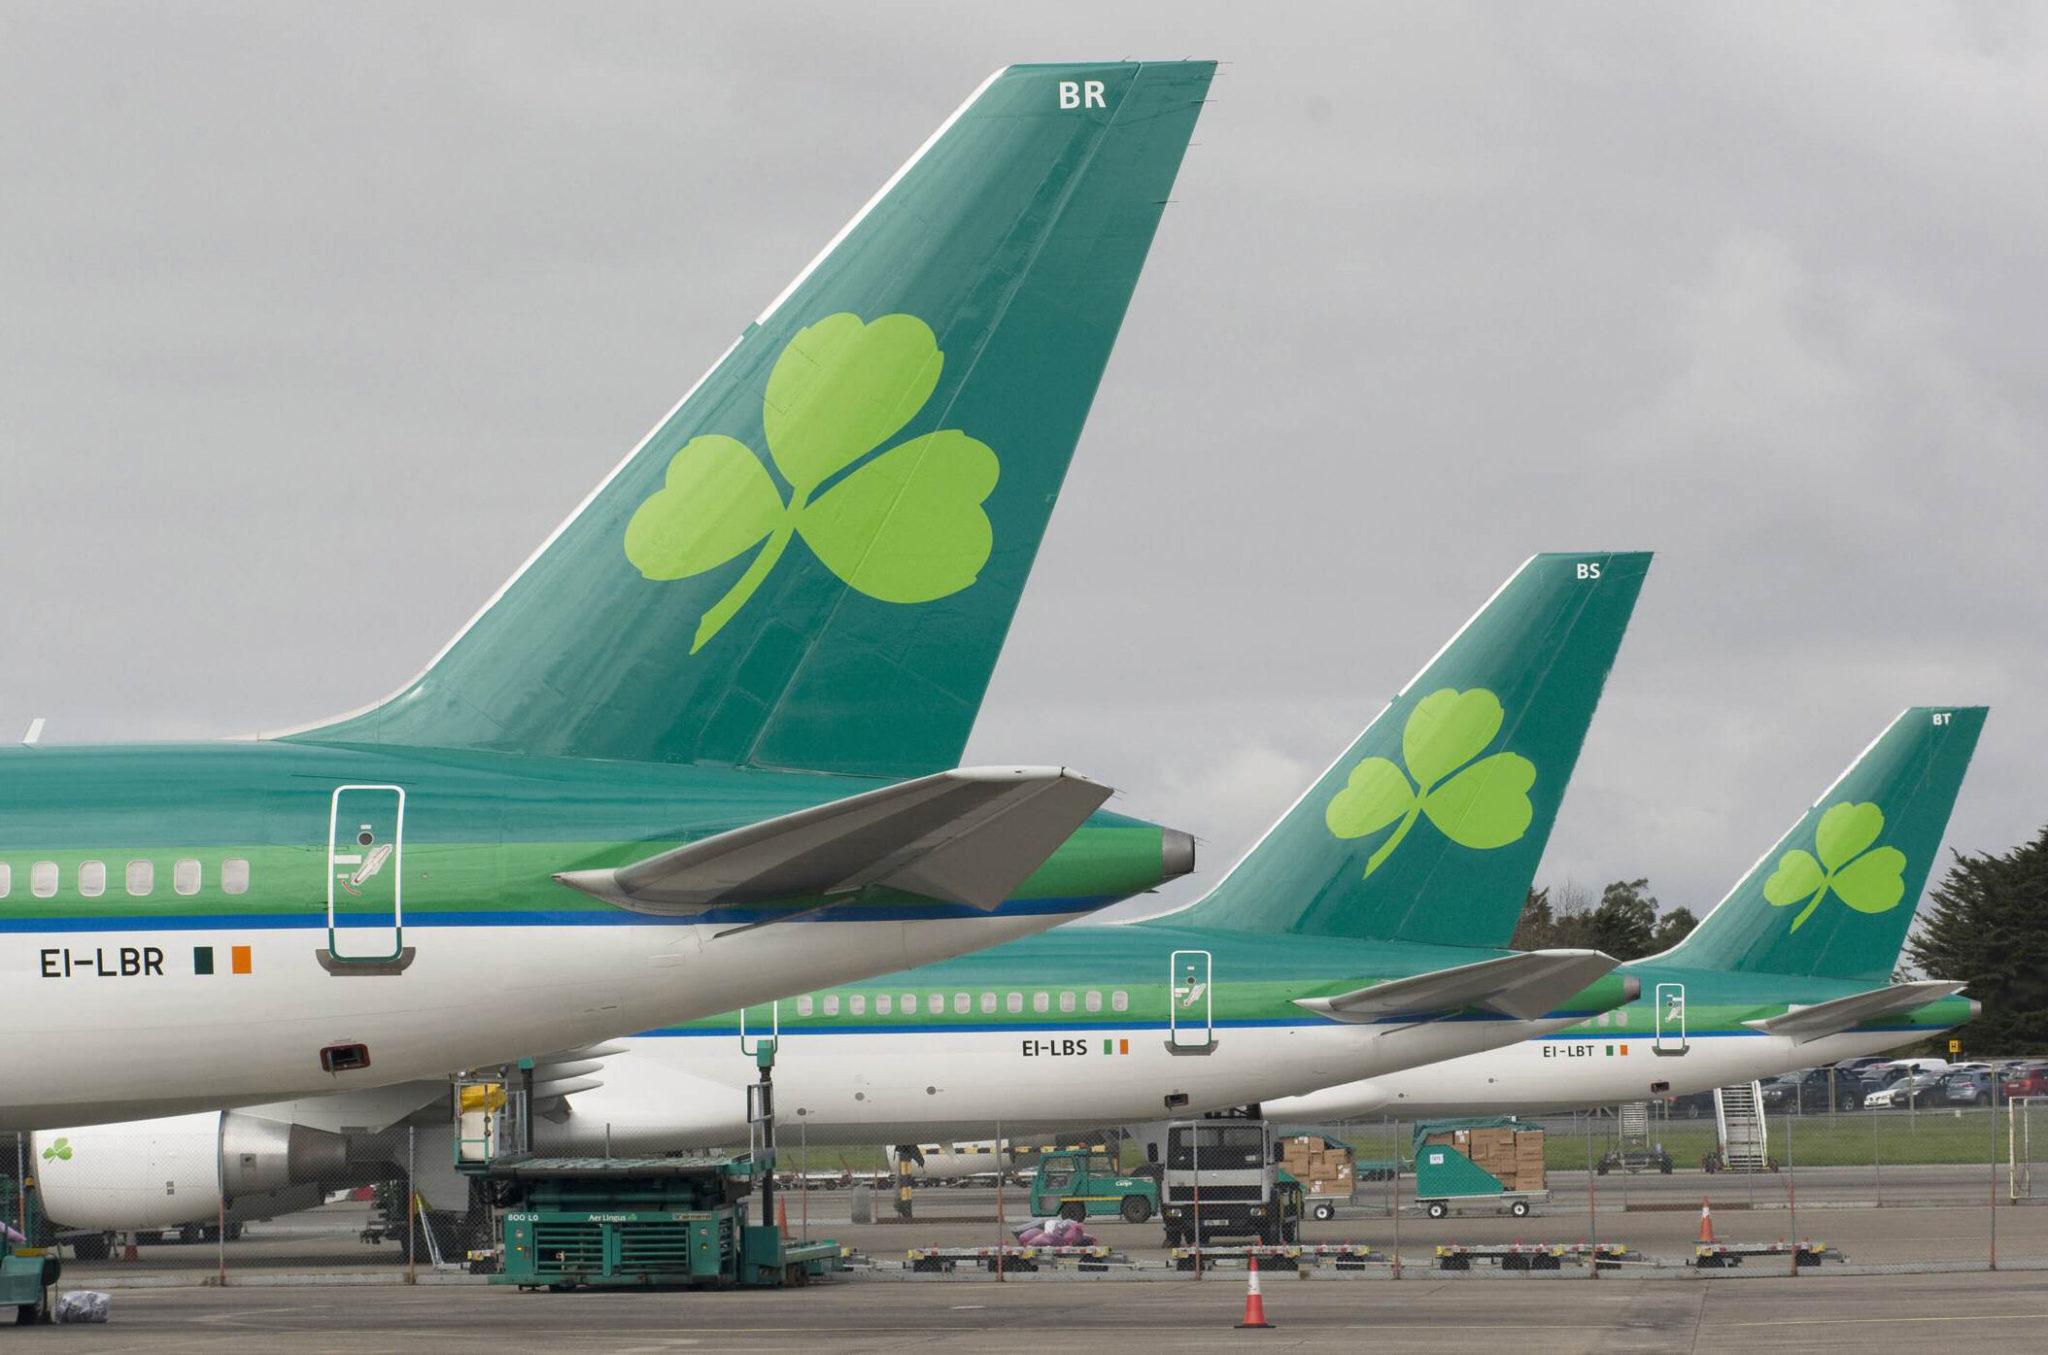 Aer Lingus Launches Not Business Class European Business